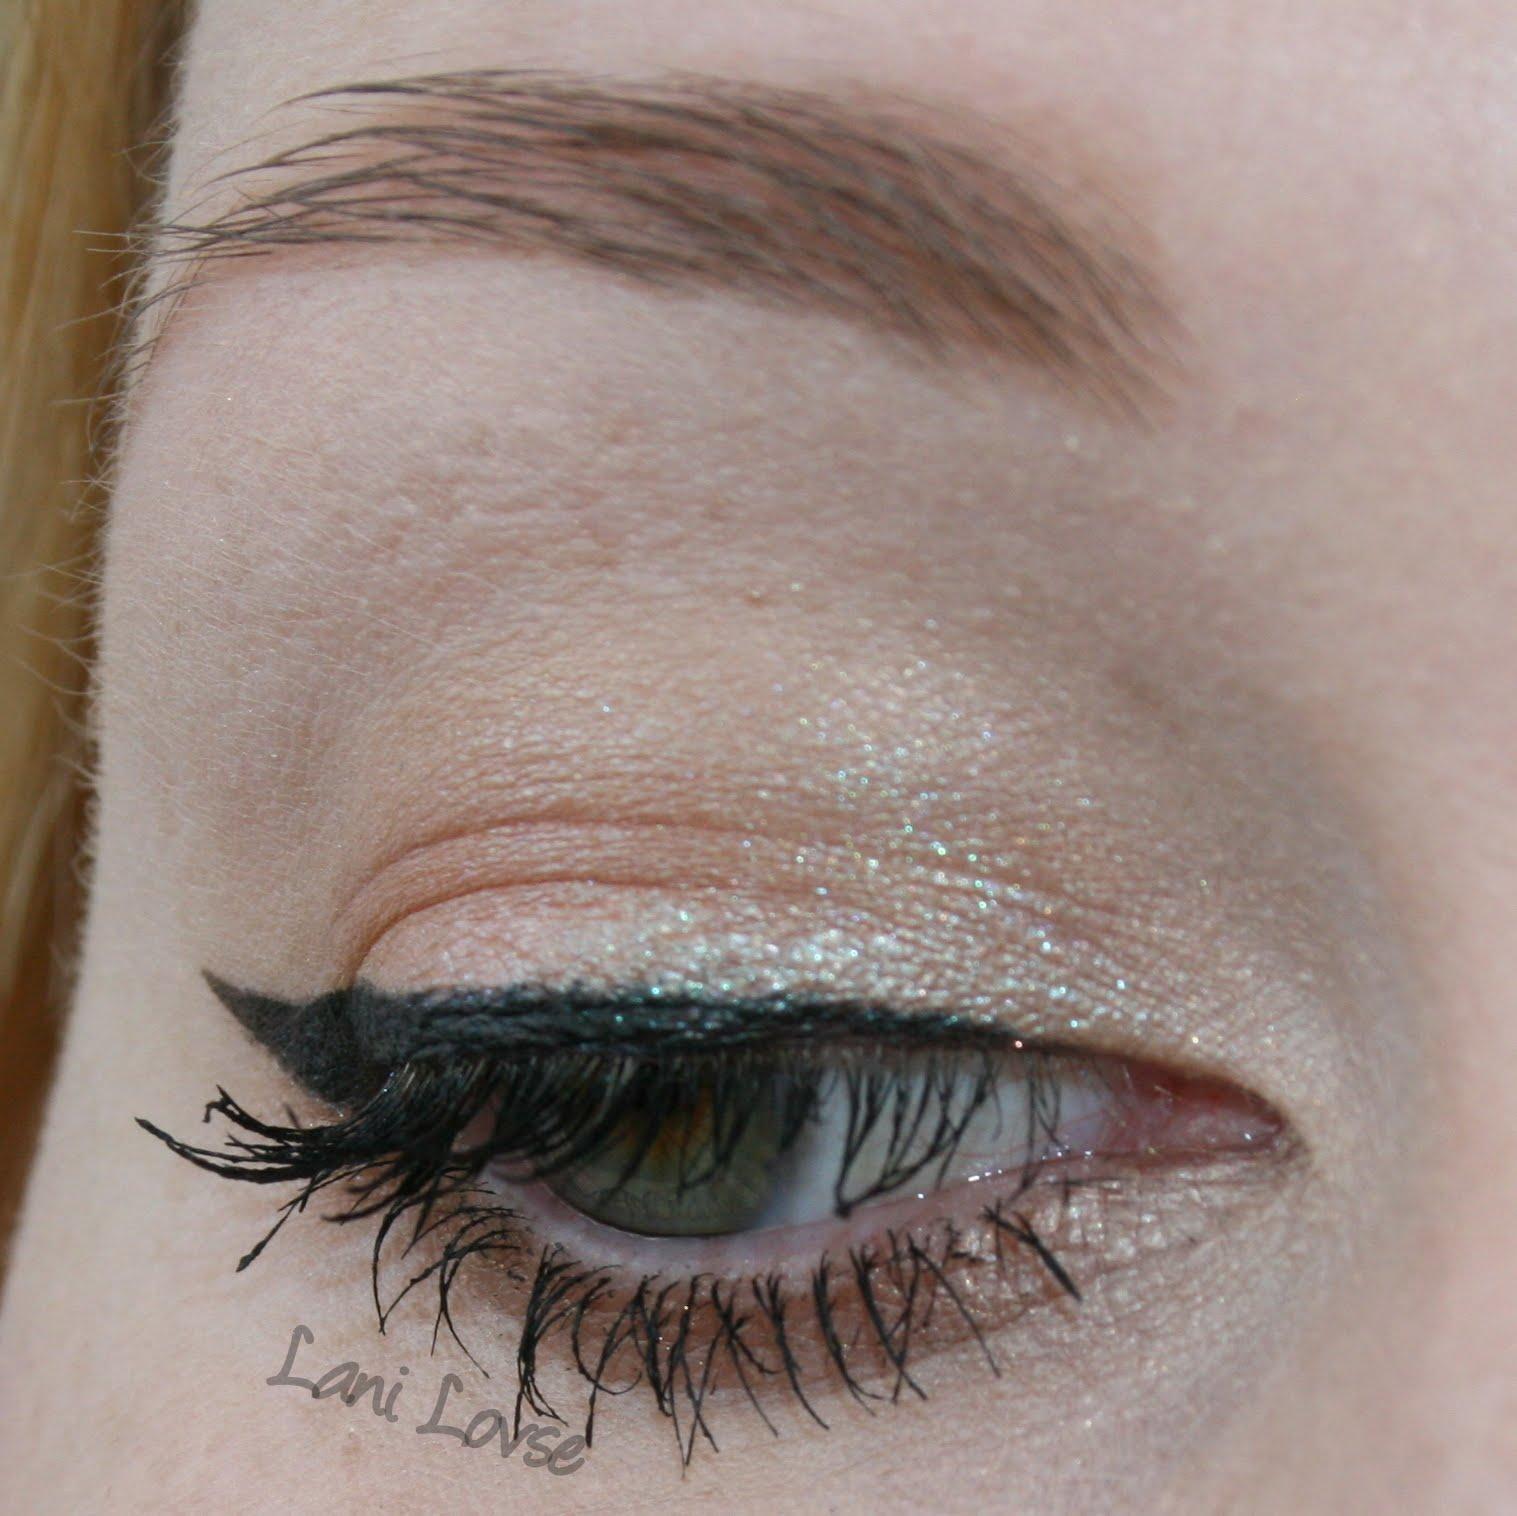 Femme Fatale Cosmetics Lightwell Eyeshadow